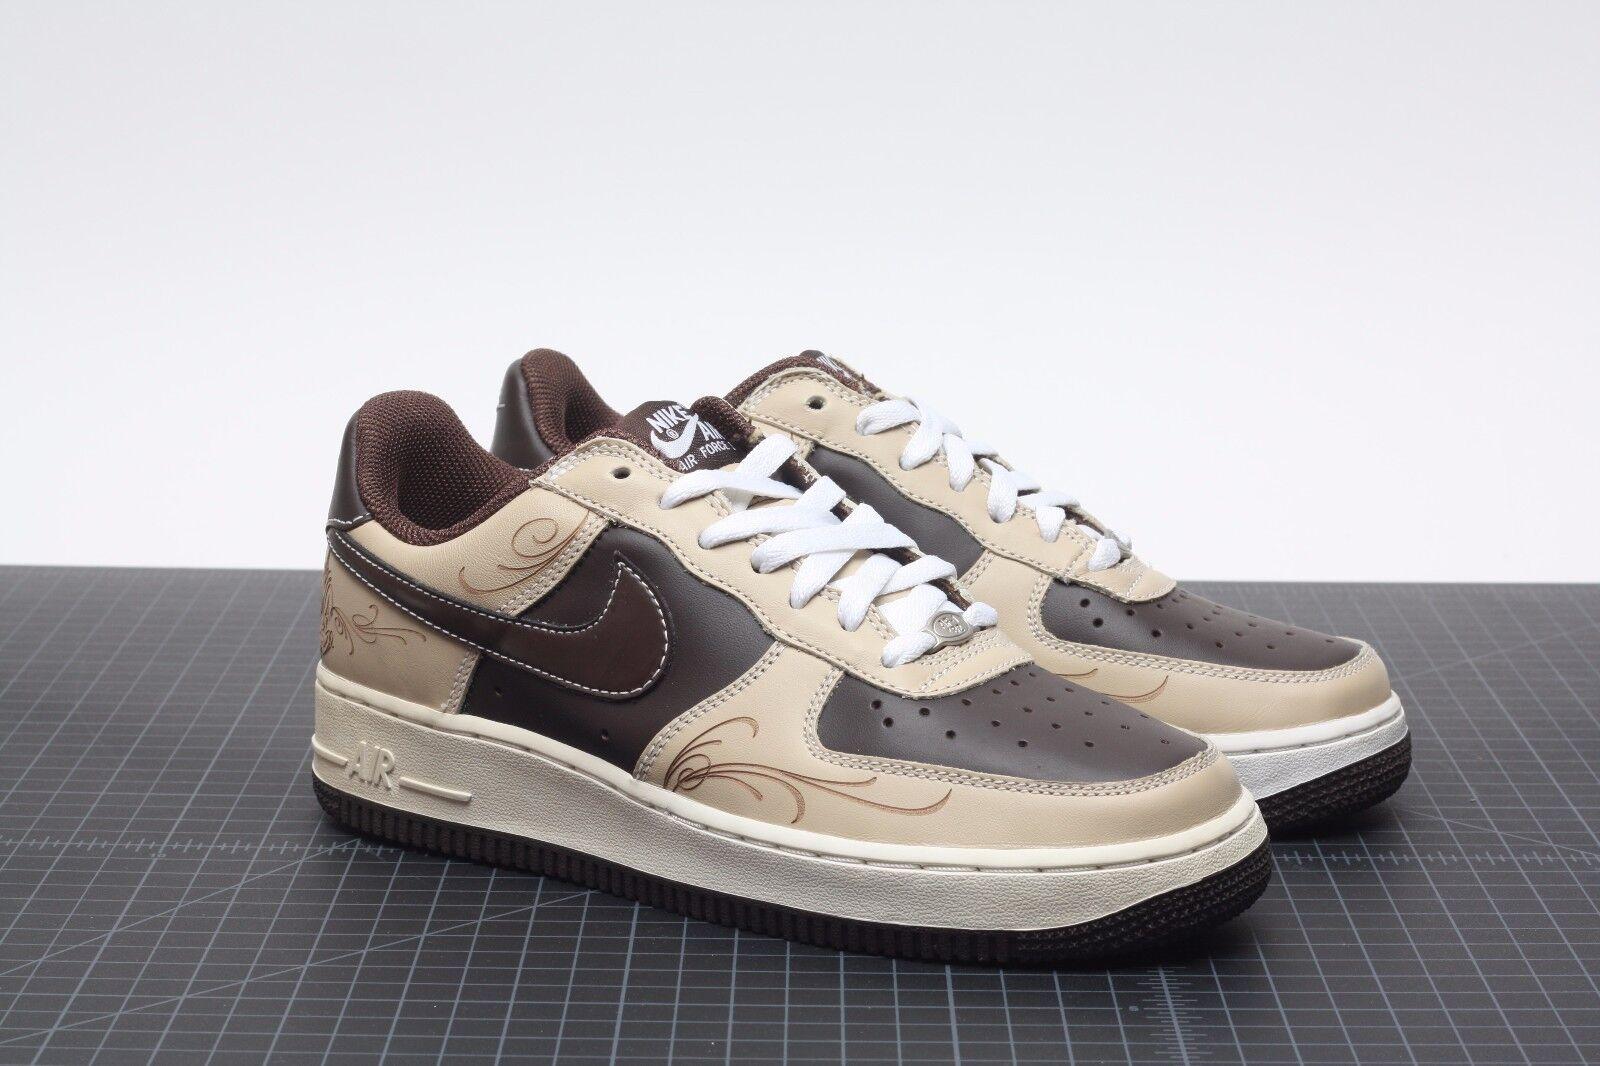 premium selection b63fc cf3a6 Nike Air Force 1 Mr Cartoon La Brown Pride Laser Linen Size 7 for ...